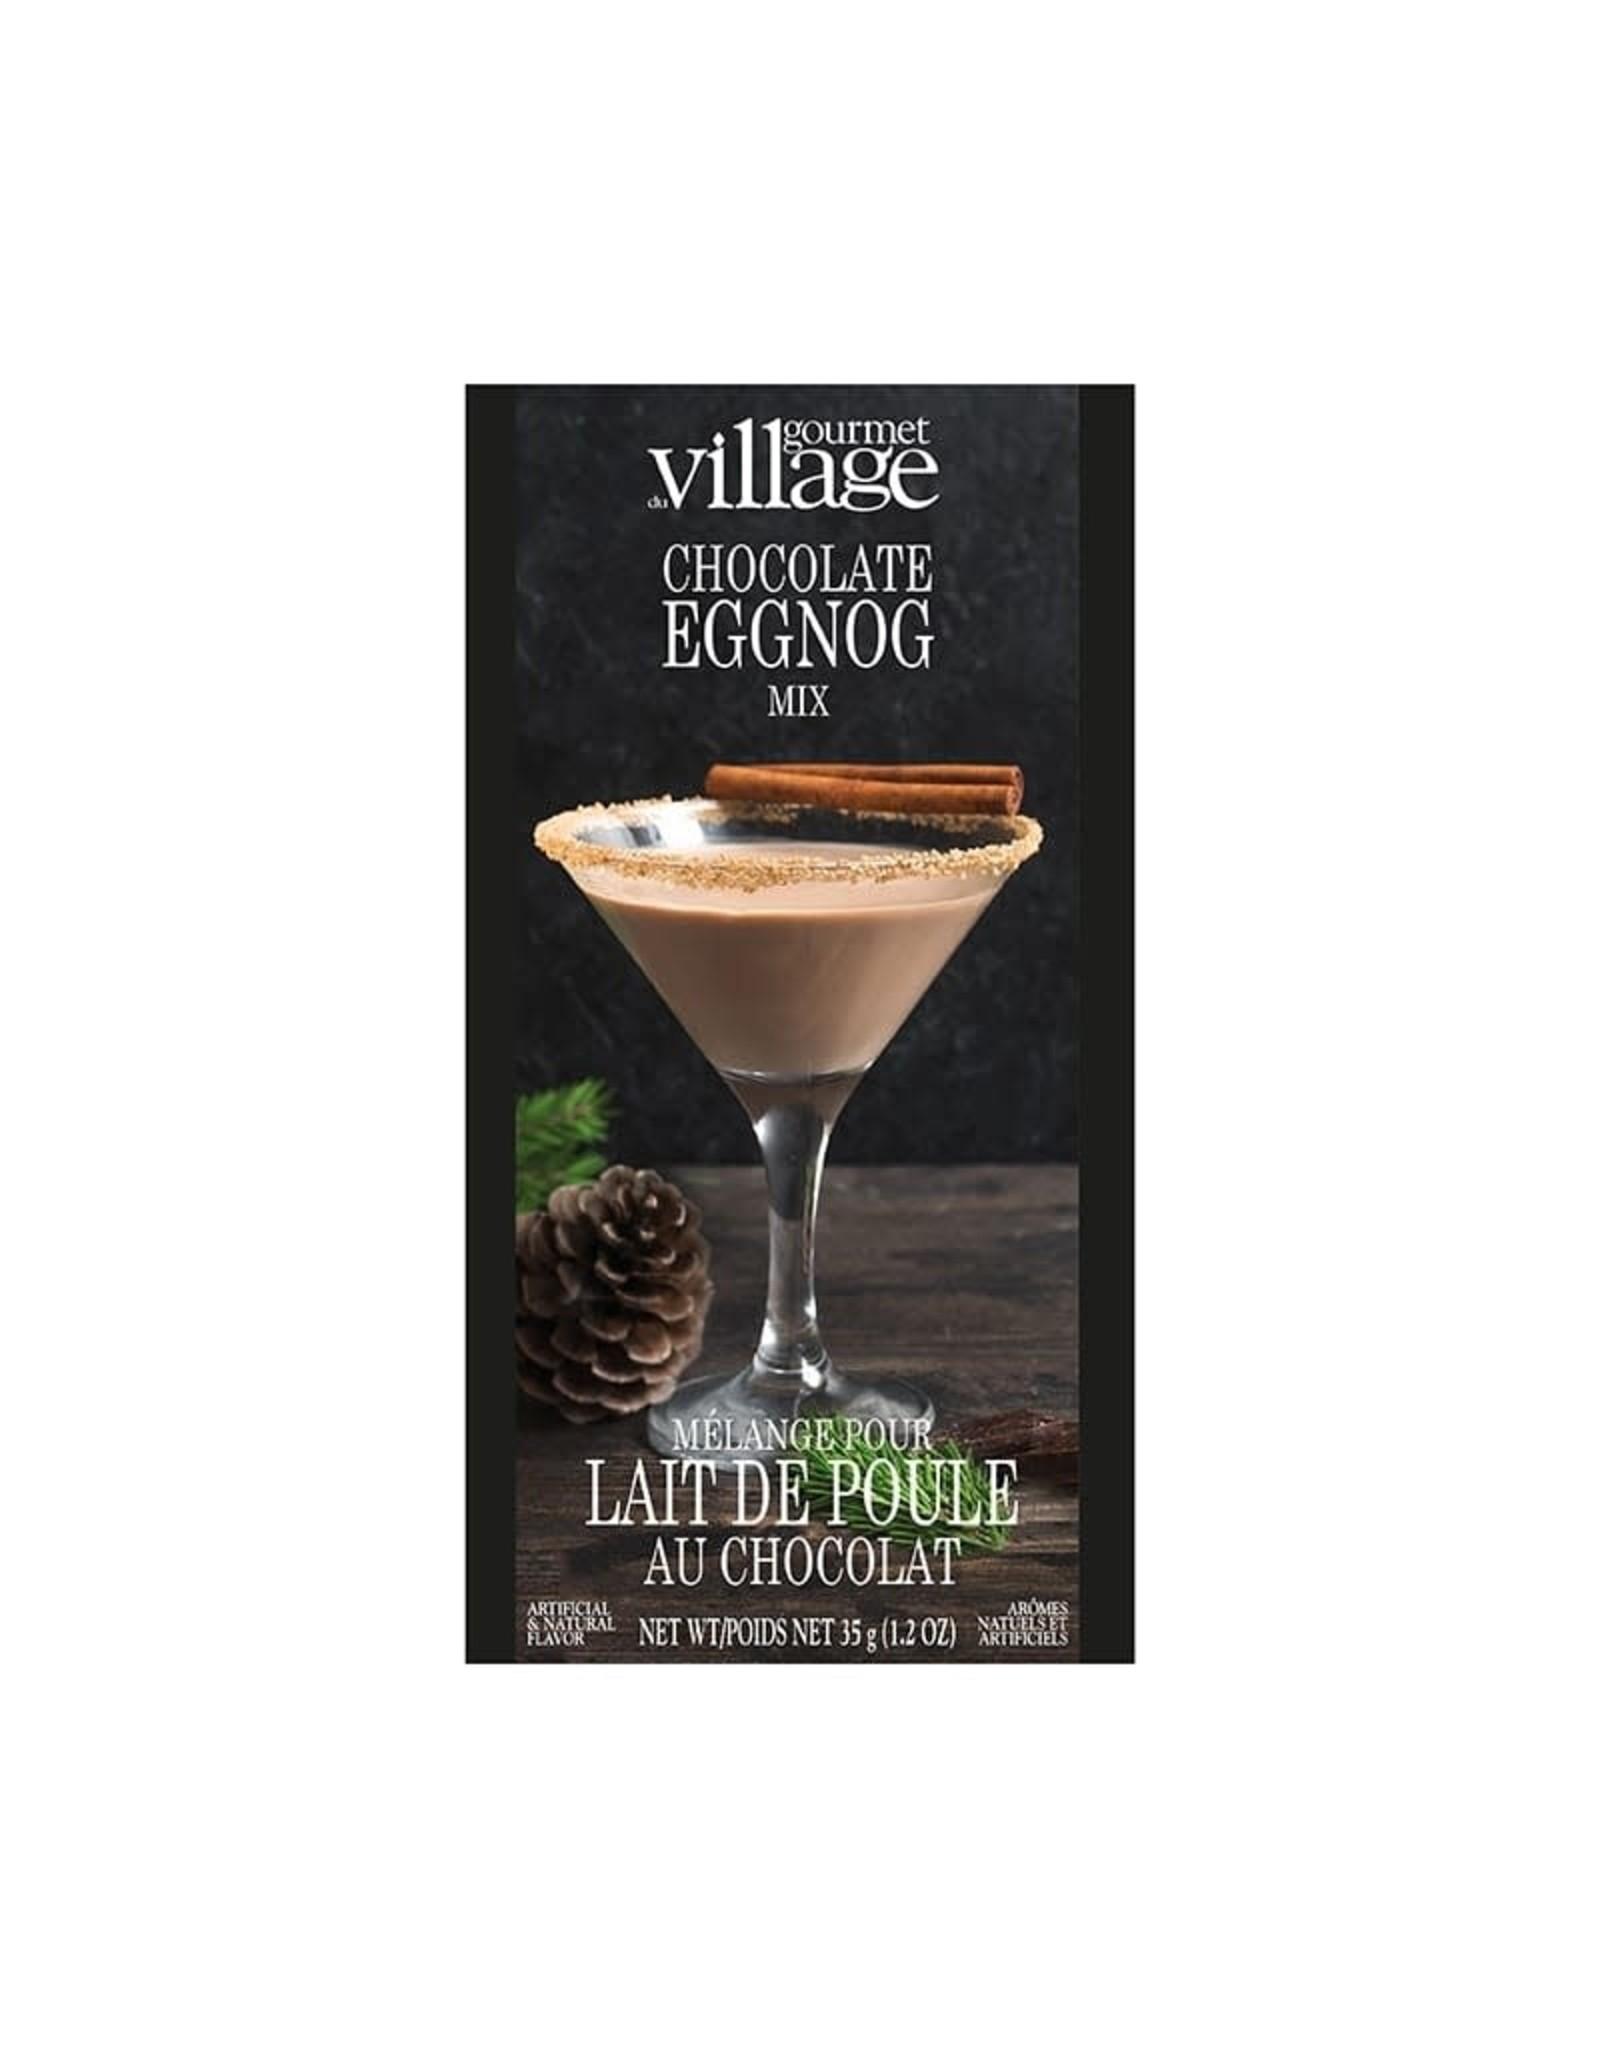 Gourmet du Village Chocolat Eggnog Mix